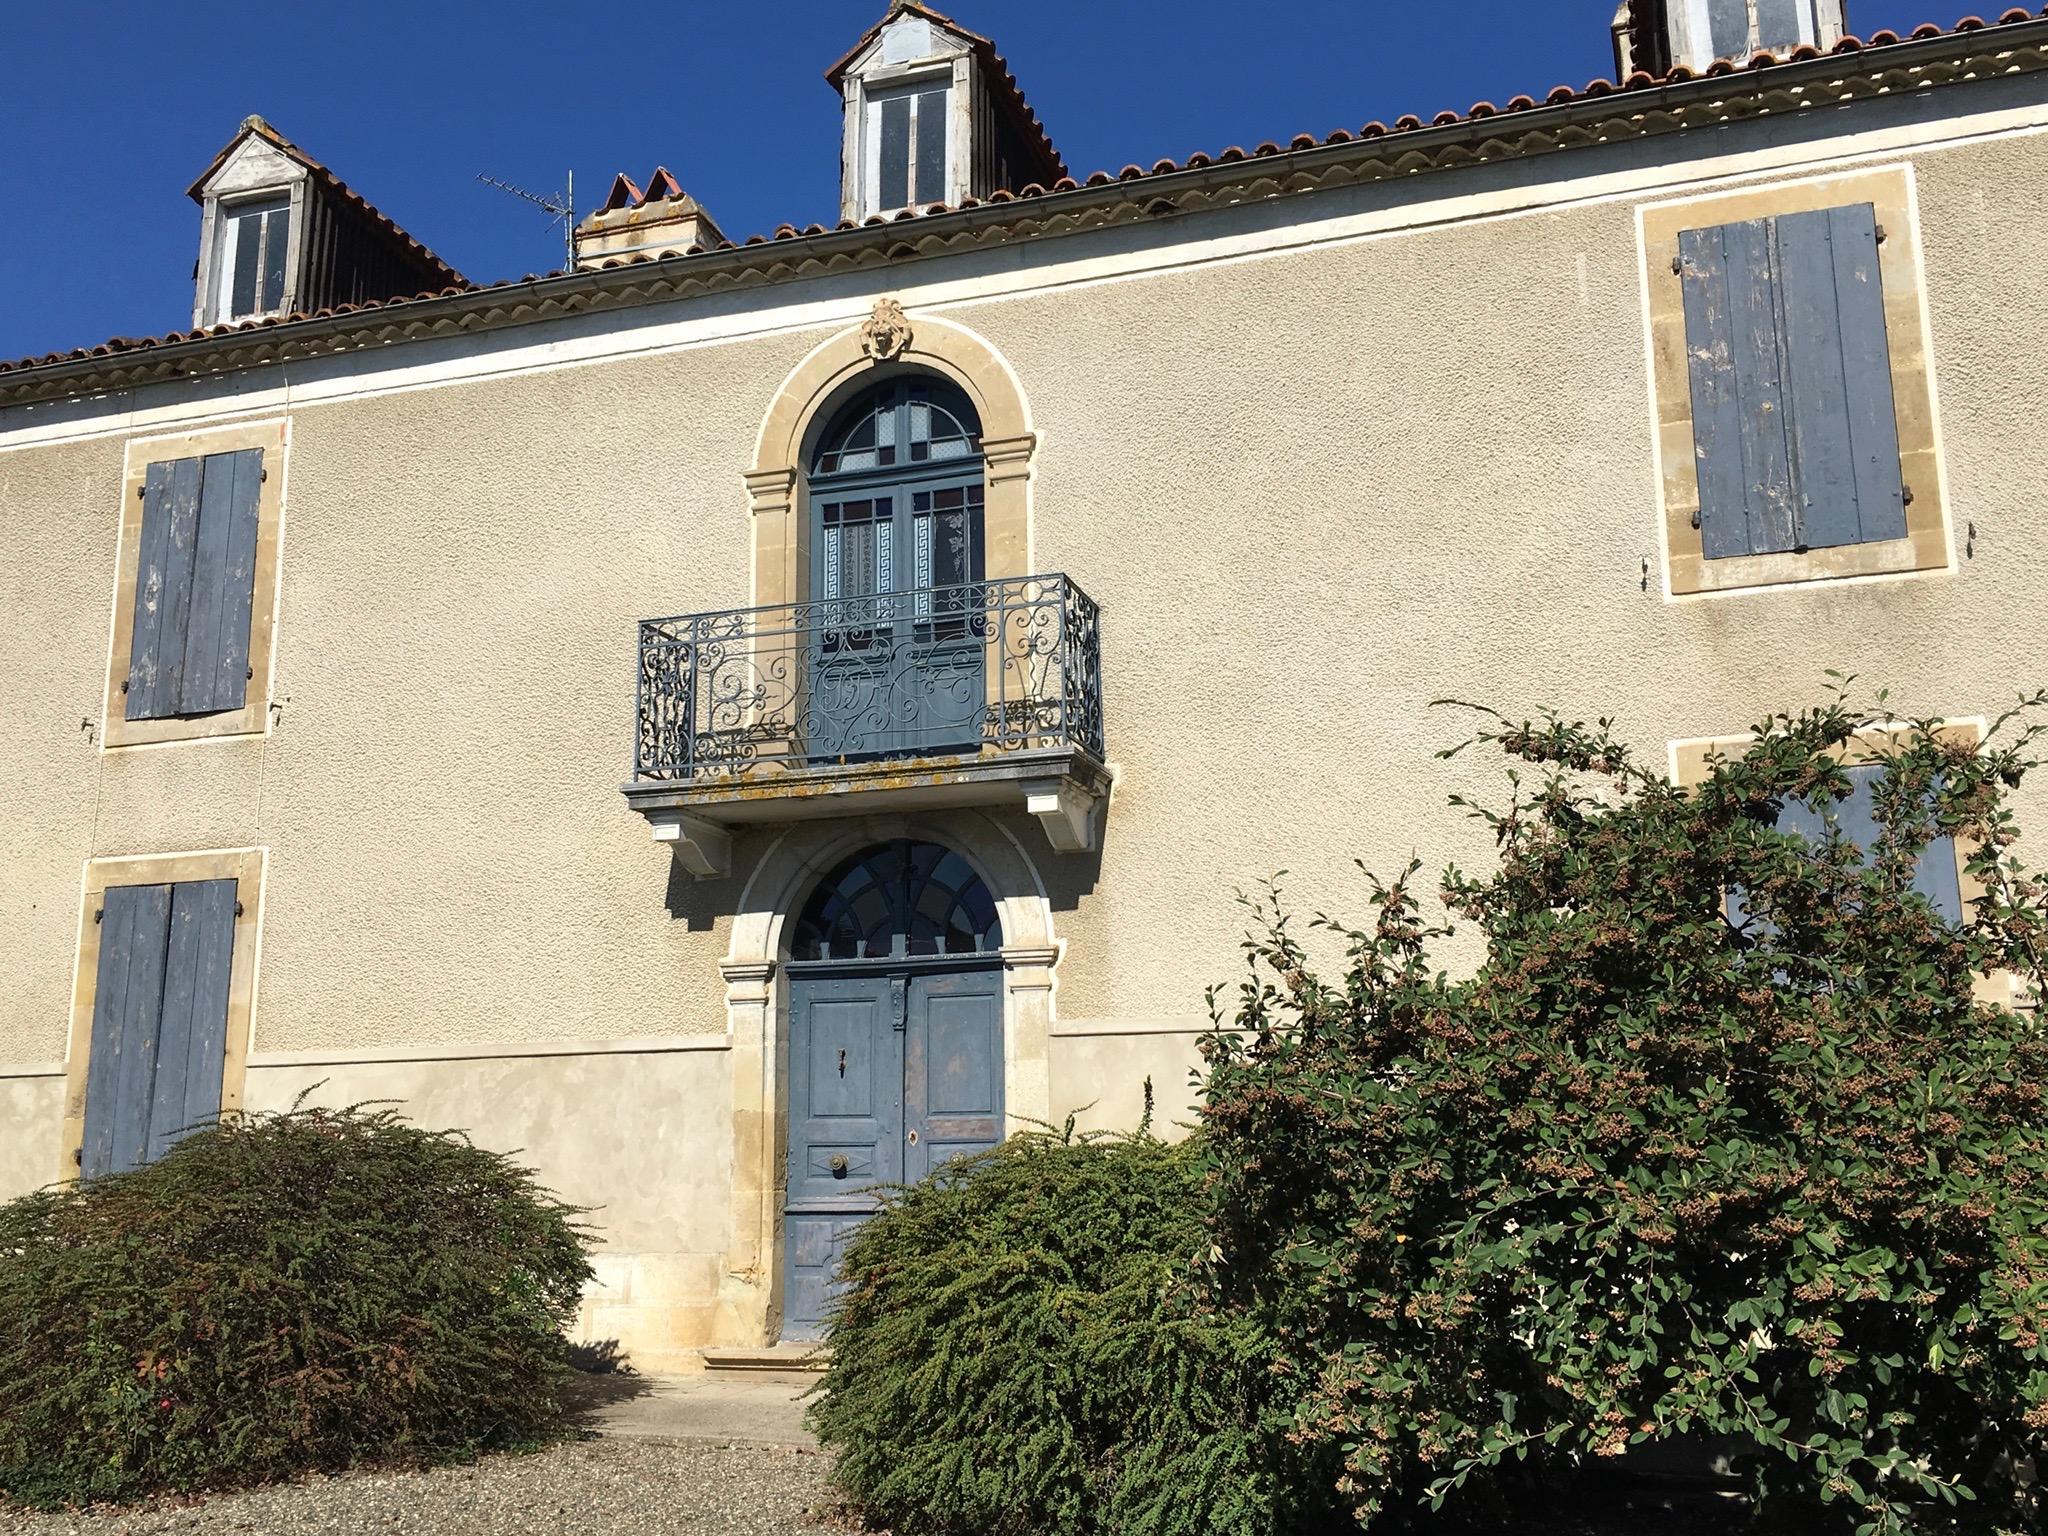 Property 7 | Domaine du Pignoulet, Gascony, France